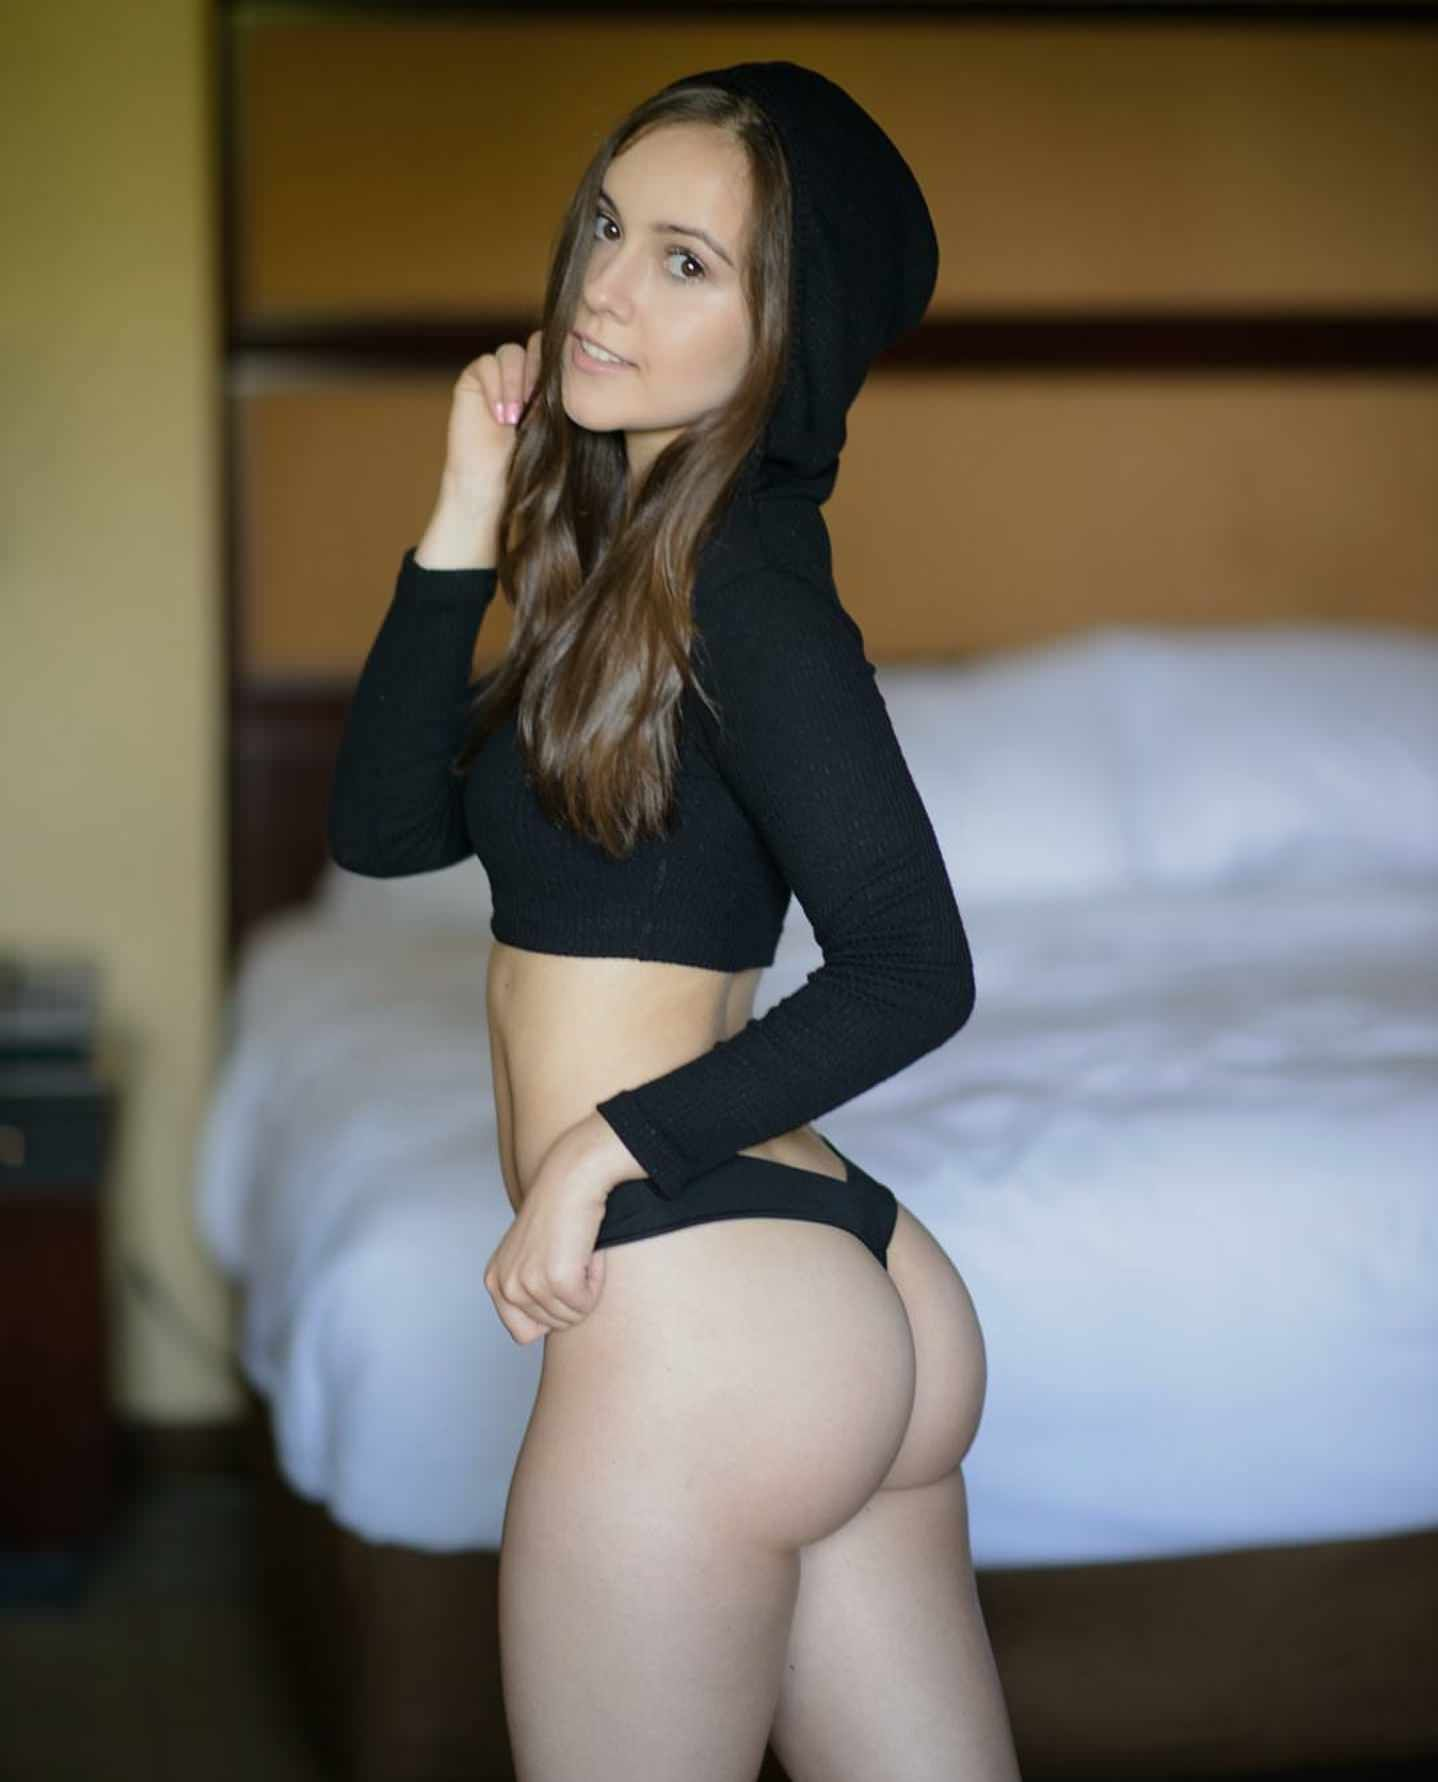 amazing ass | niiiiice | pinterest | mma and woman